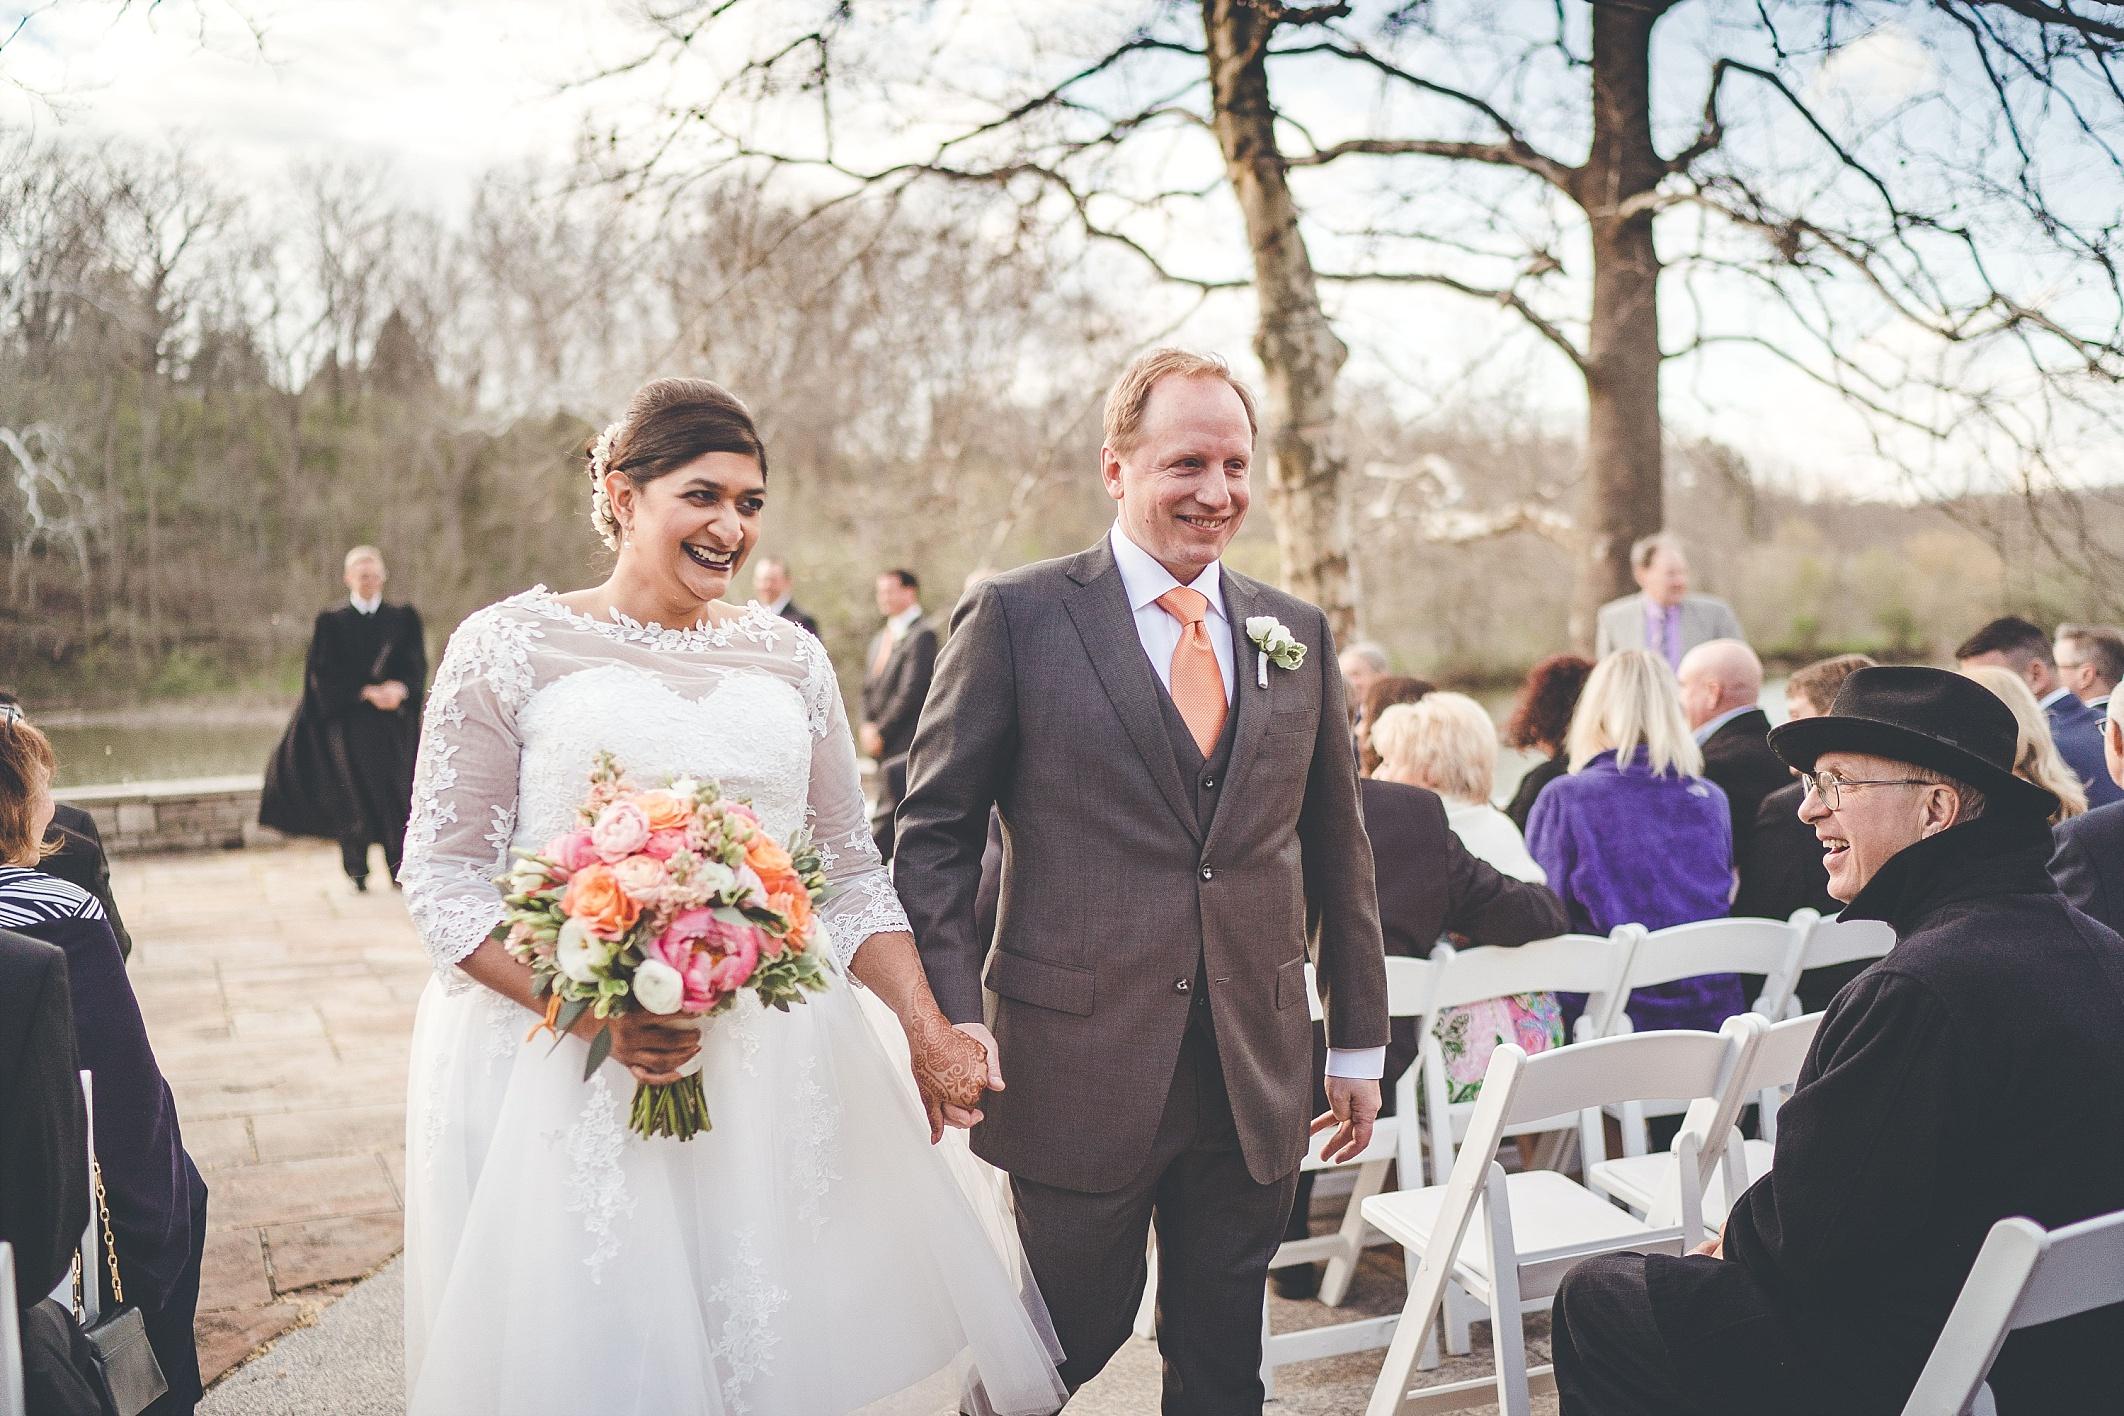 2710_dayton-indian-wedding-photographer-beavercreek_0065.jpg